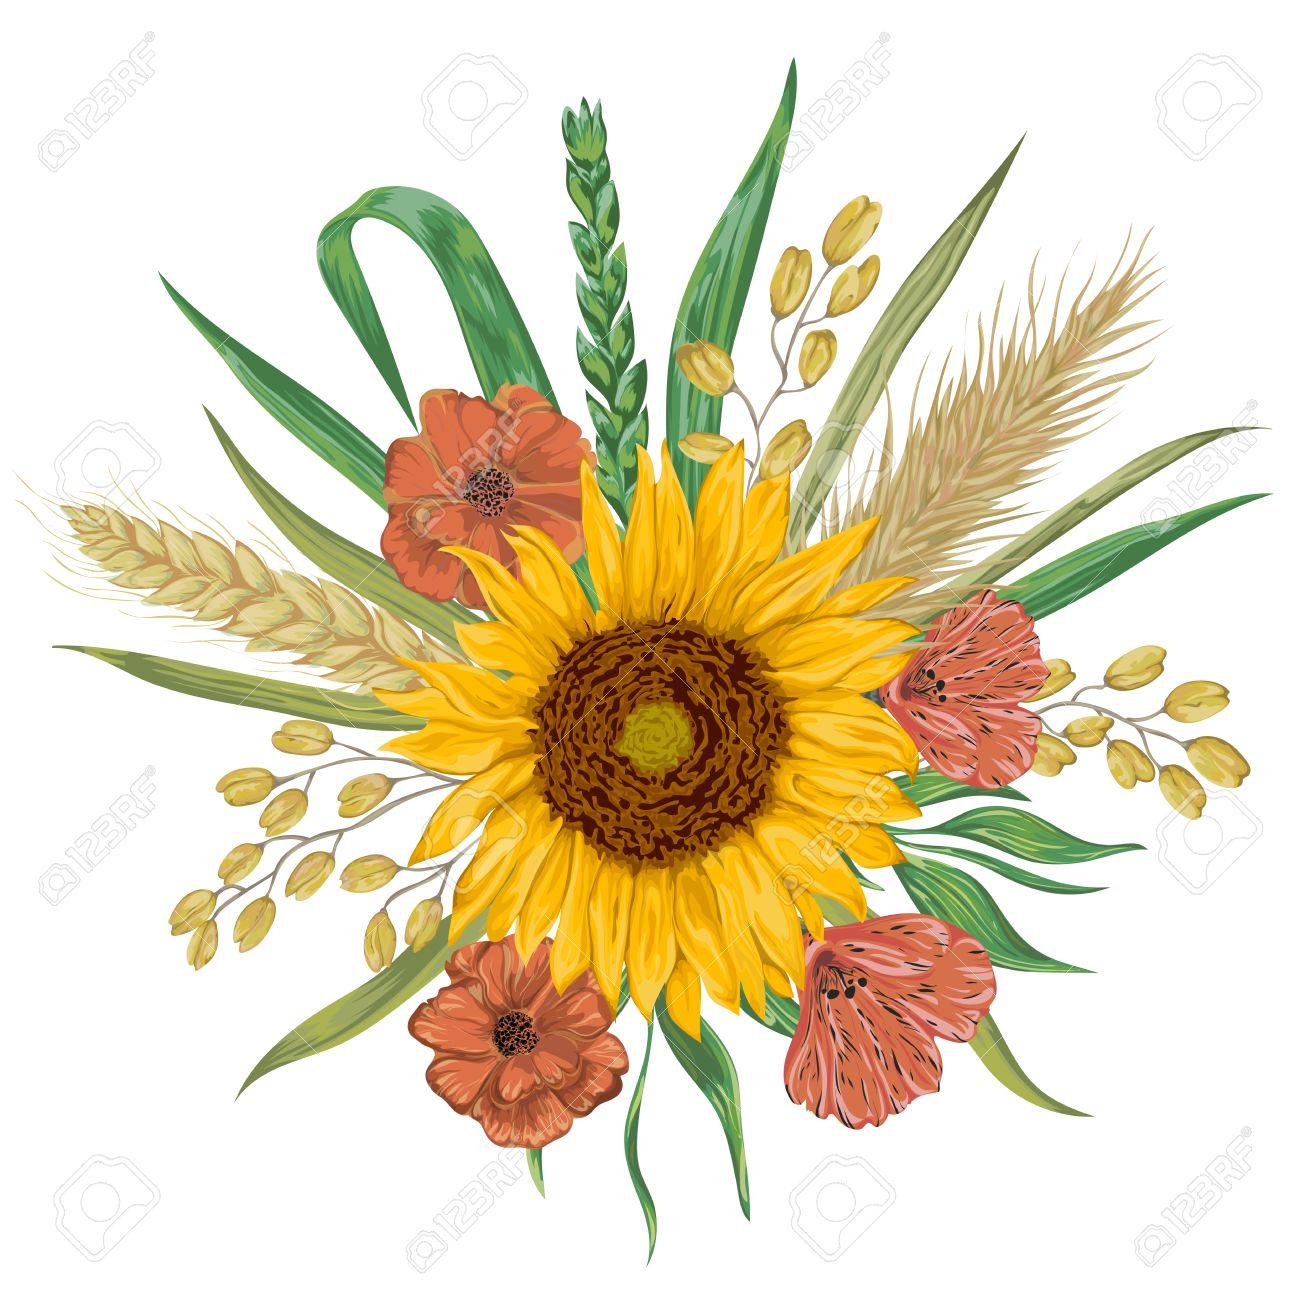 Sunflower, barley, wheat, rye, rice, poppy  Collection decorative